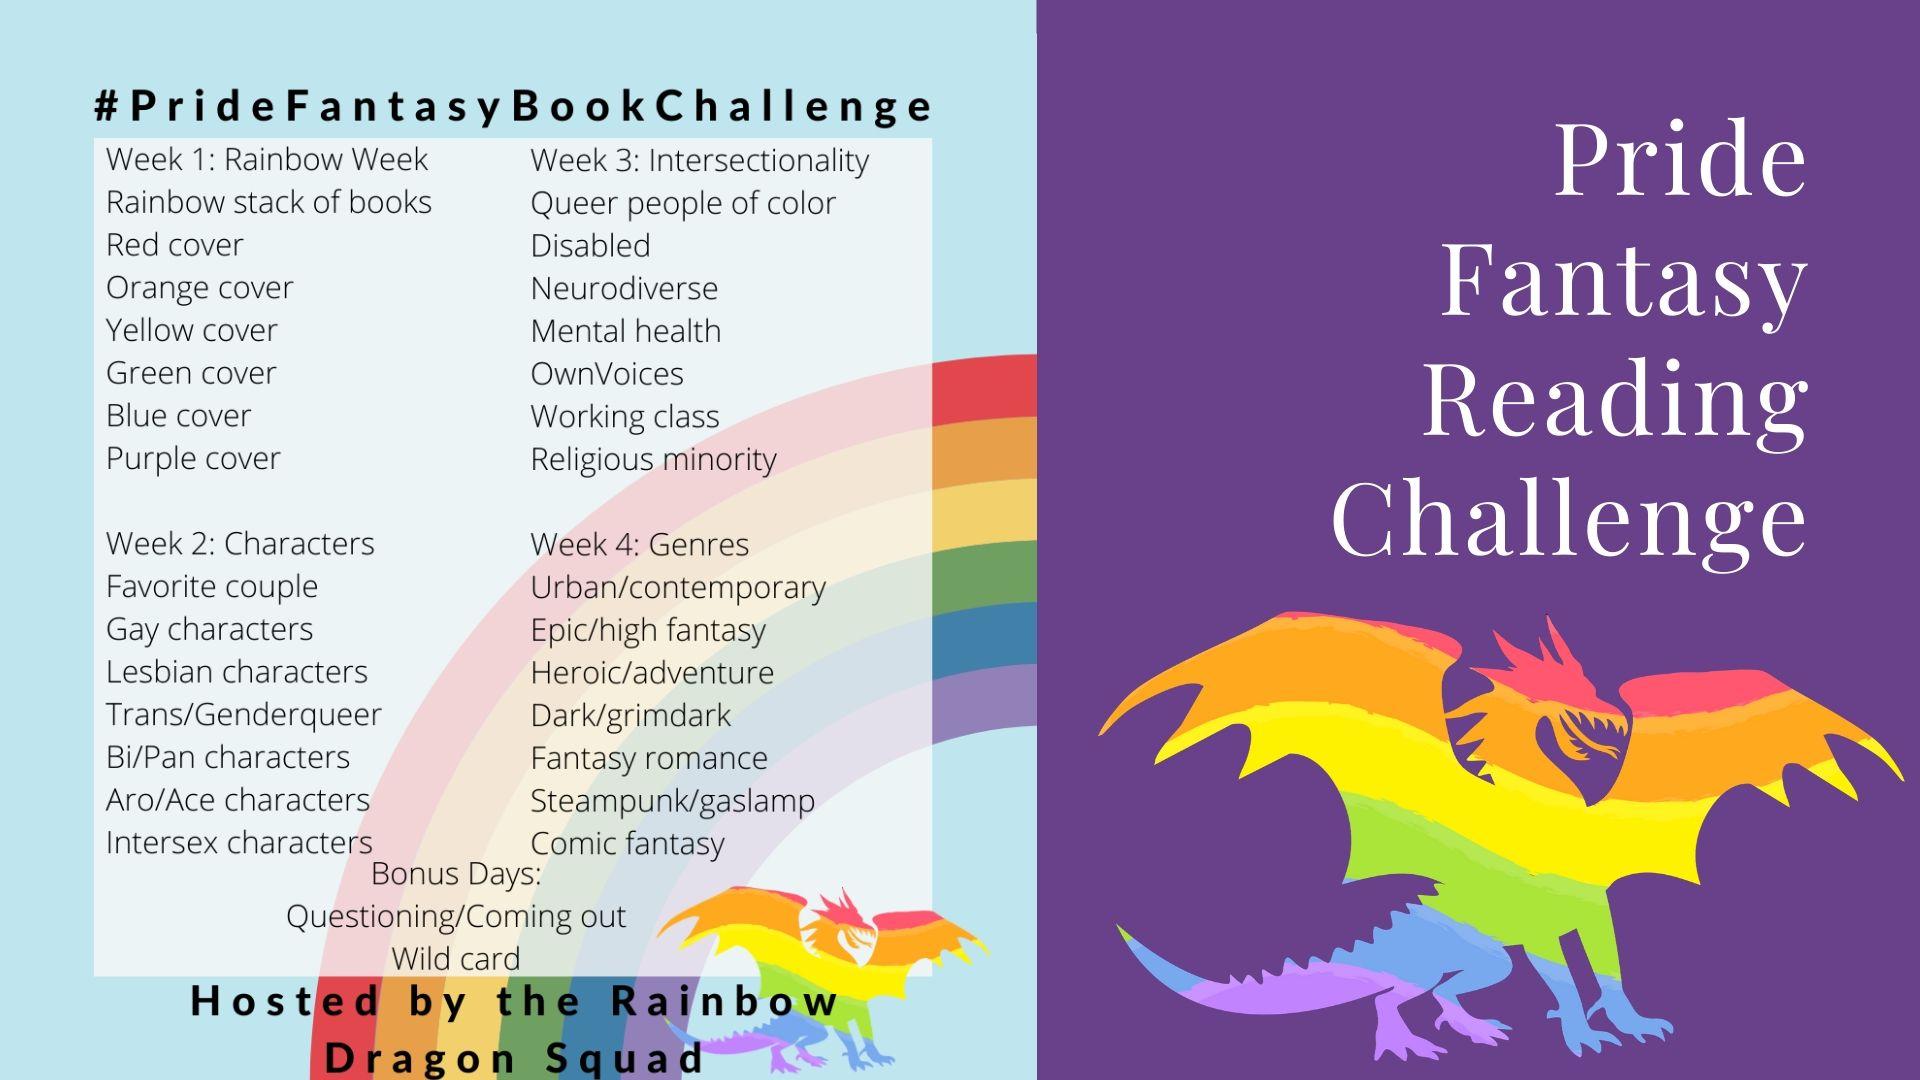 #PrideFantasyBookChallenge